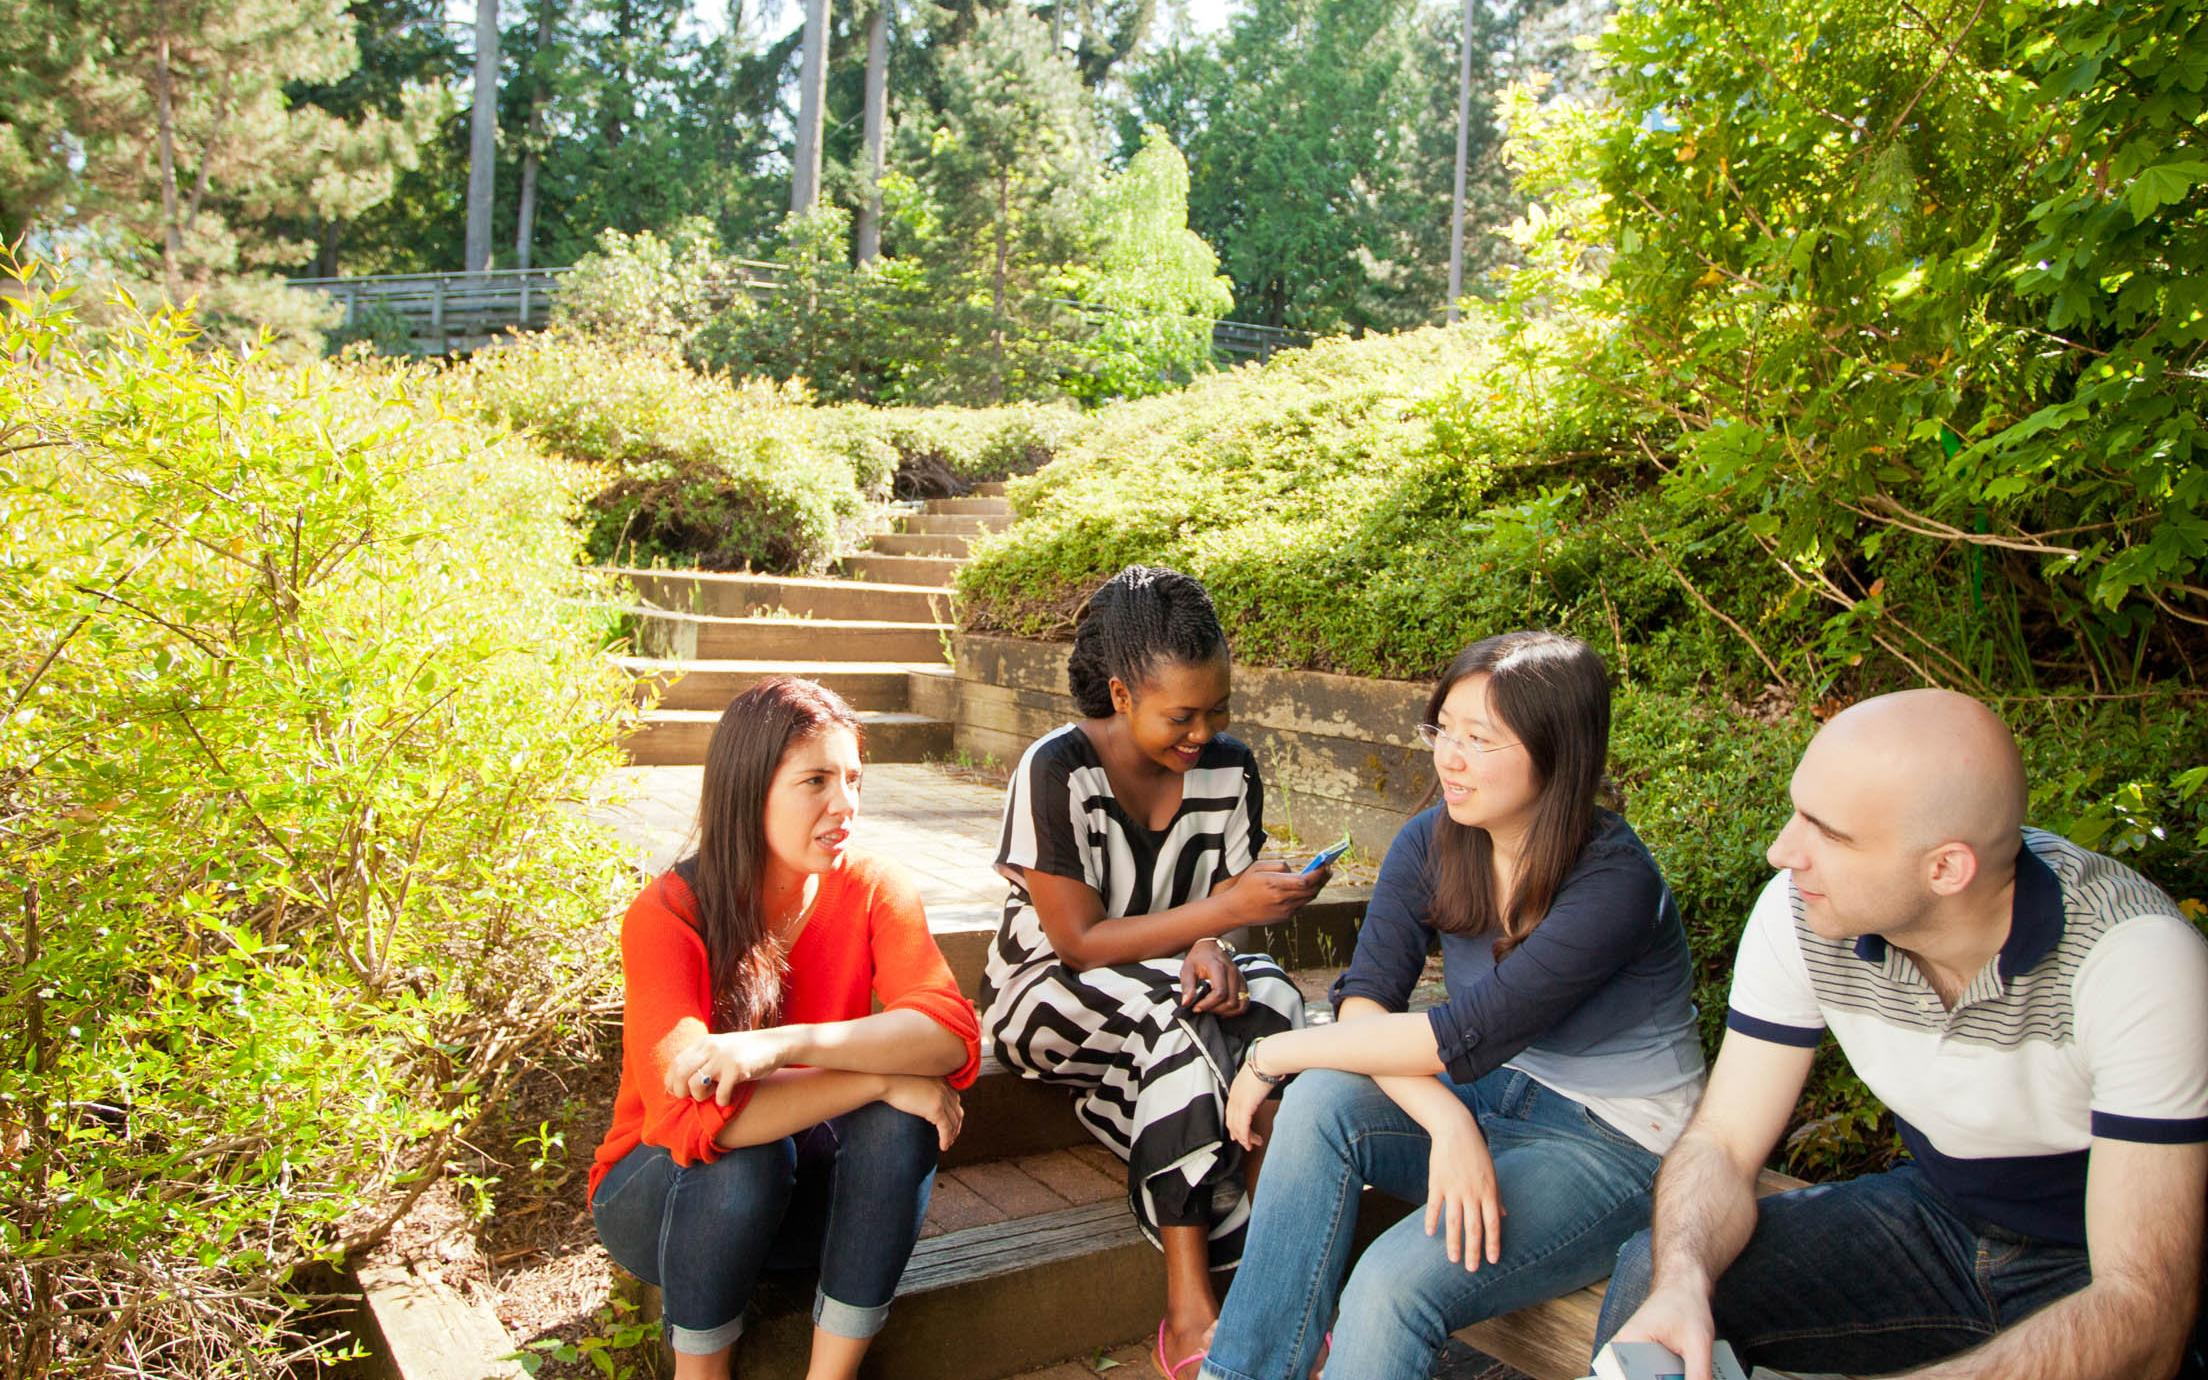 Bachelor of Arts, Major, Minor in Global Studies enjoying the beautiful Nanaimo campus